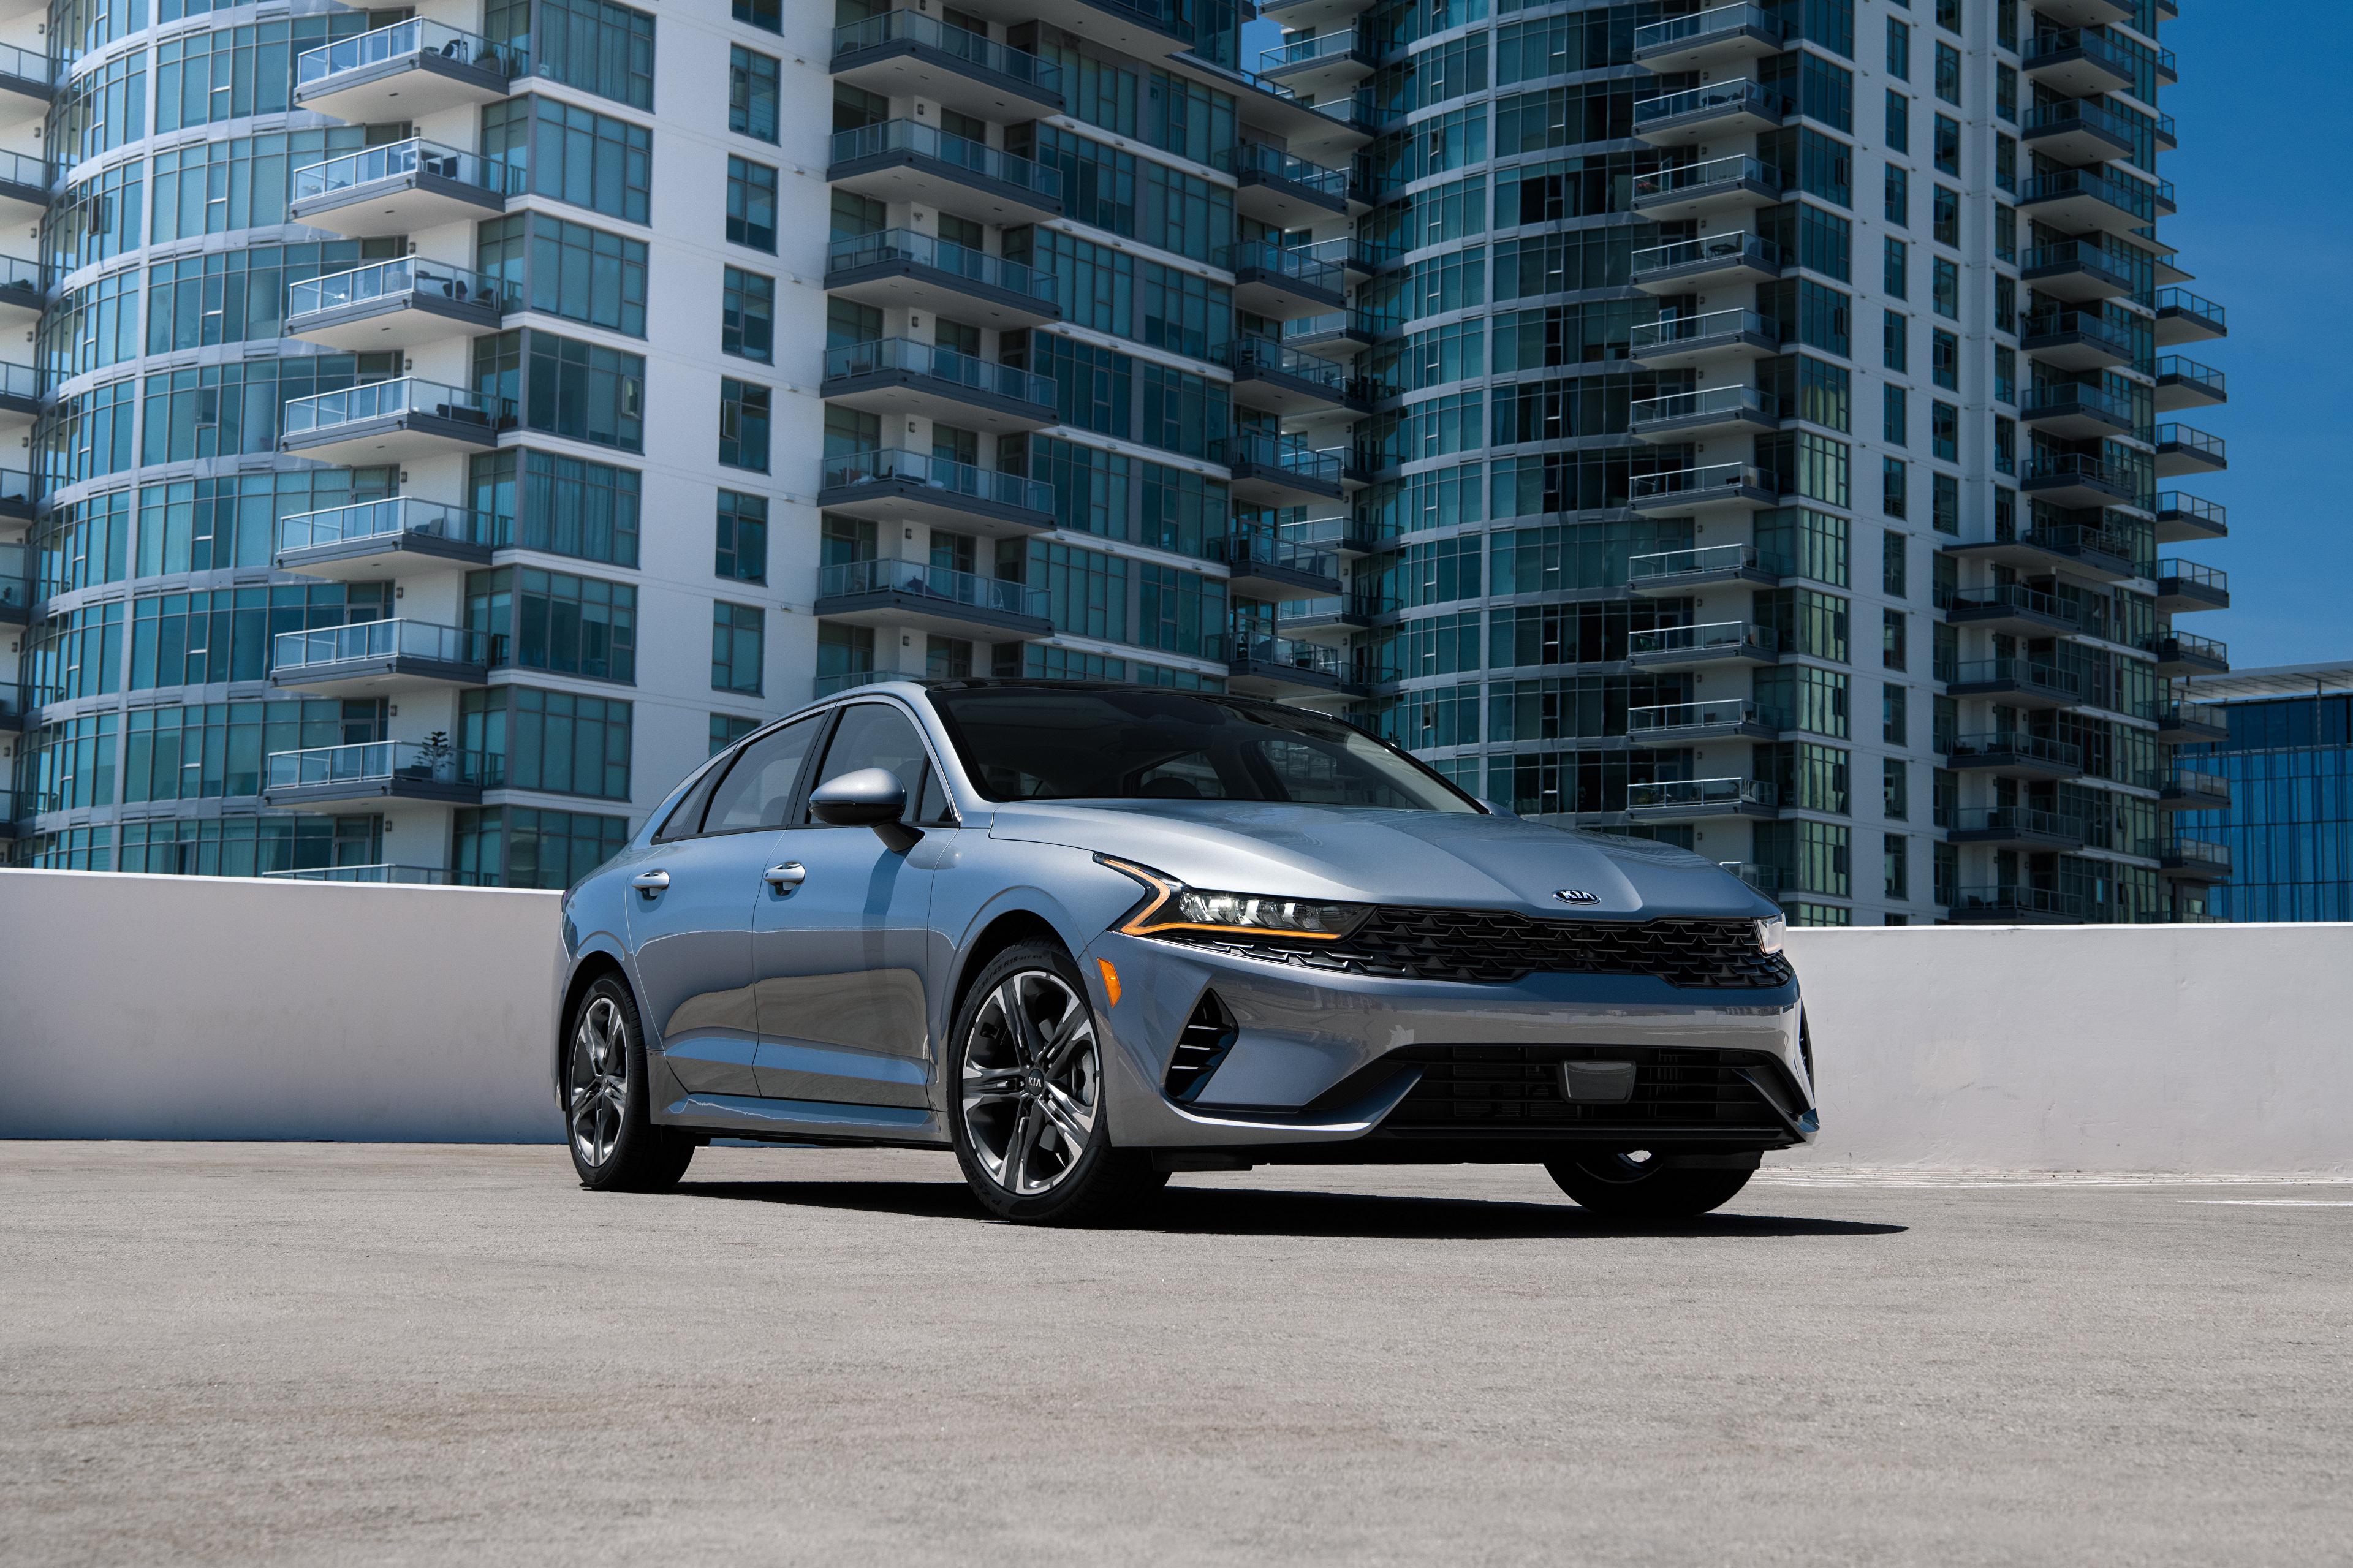 photo kia k5 ex north america, 2020 metallic automobile